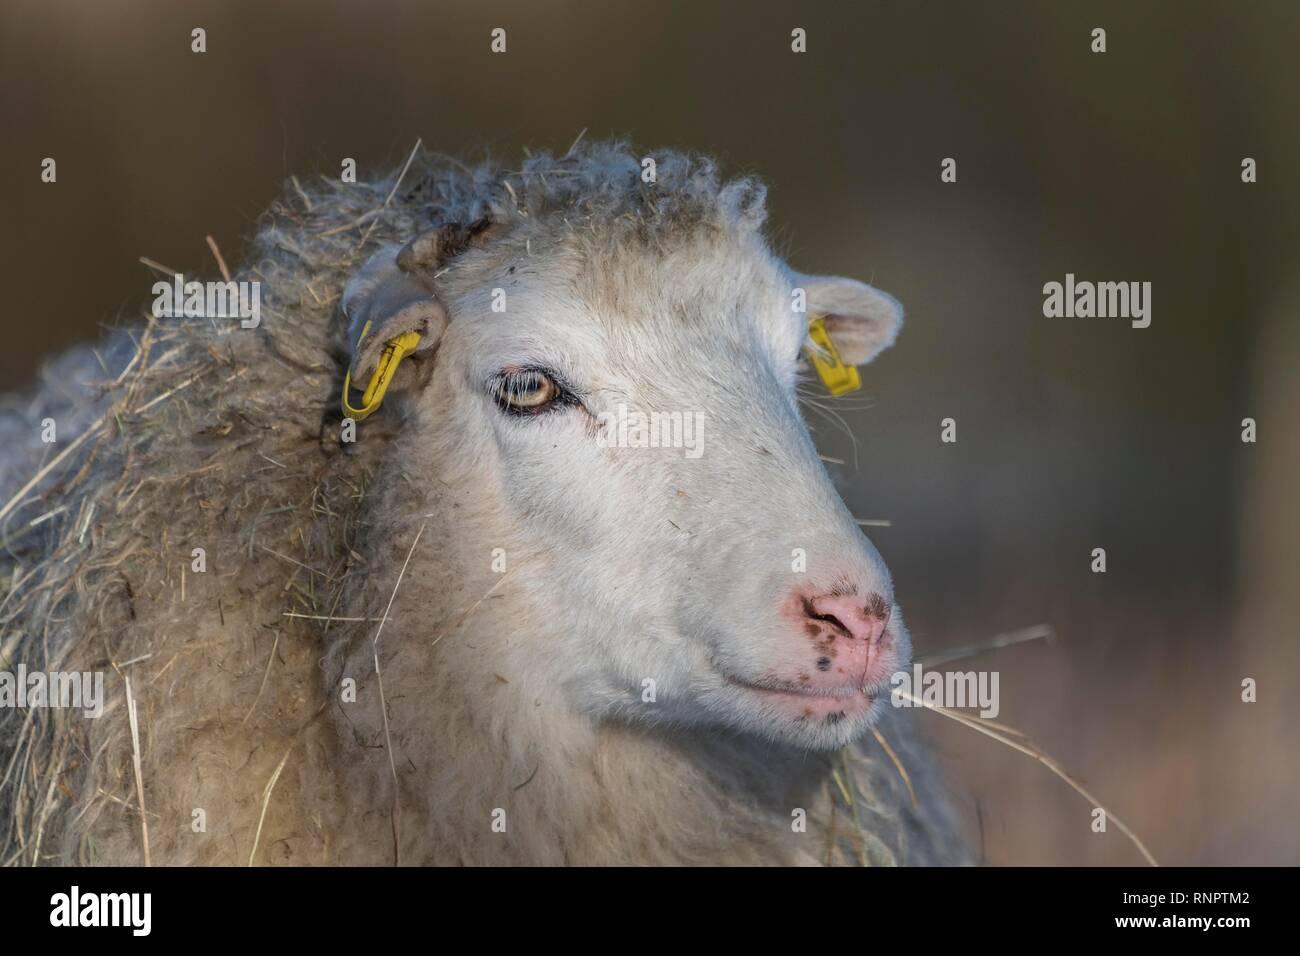 Old domestic sheep breed Skudde in winter, red list, animal portrait, captive, Brandenburg, Germany - Stock Image